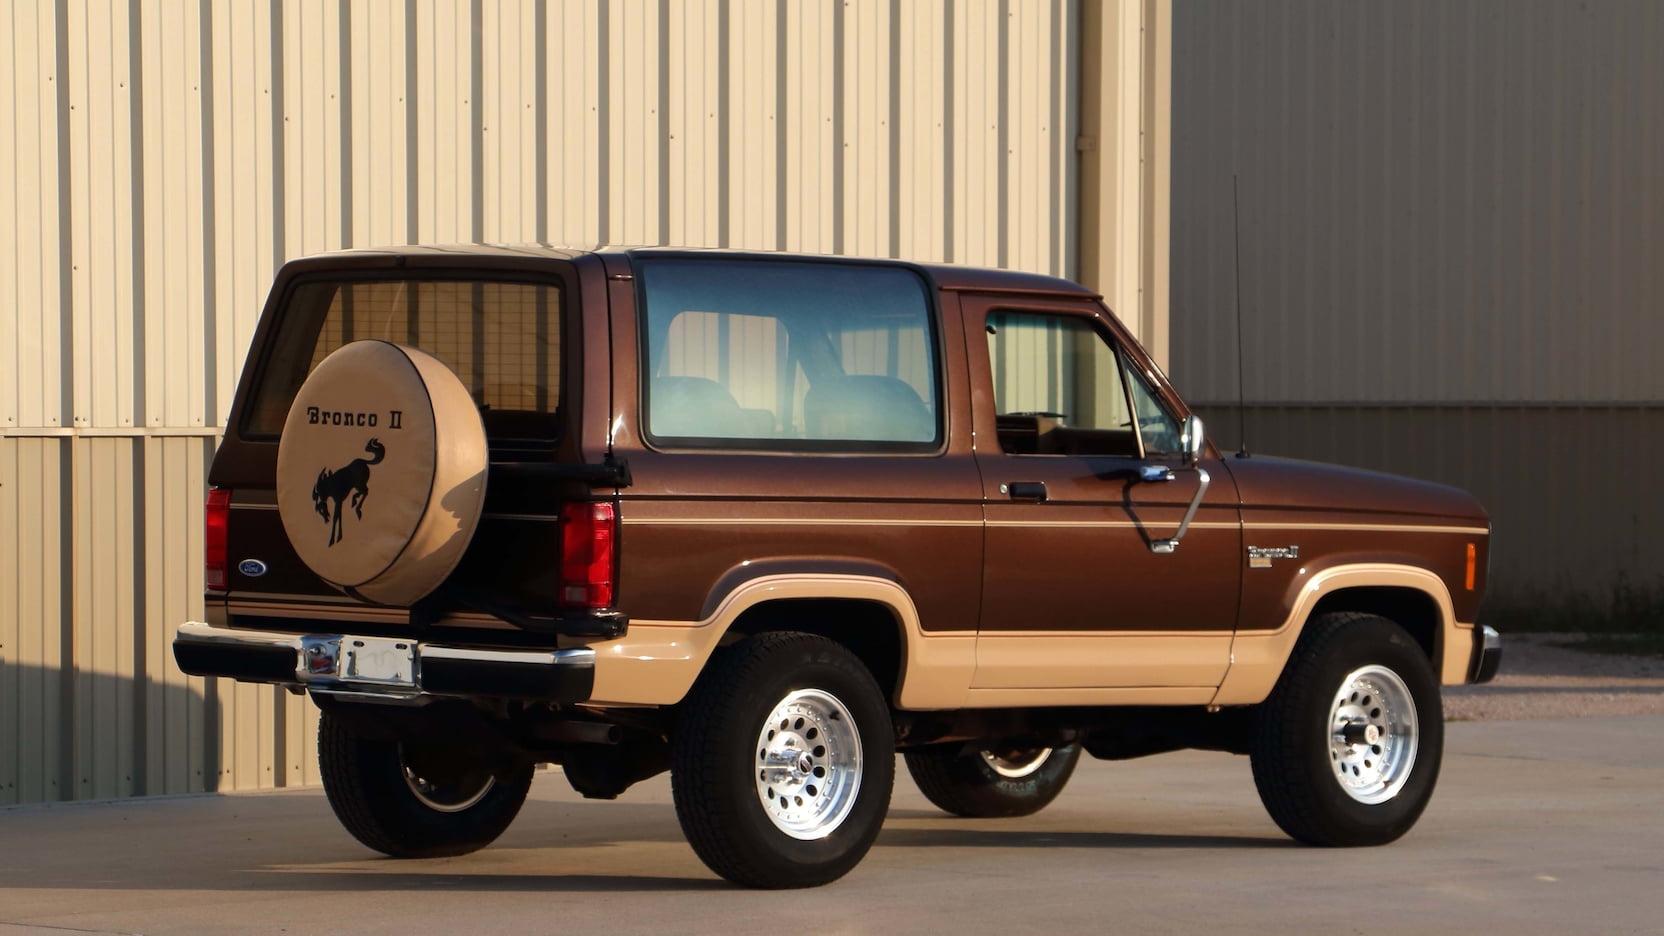 1987 Ford Bronco II rear 3/4